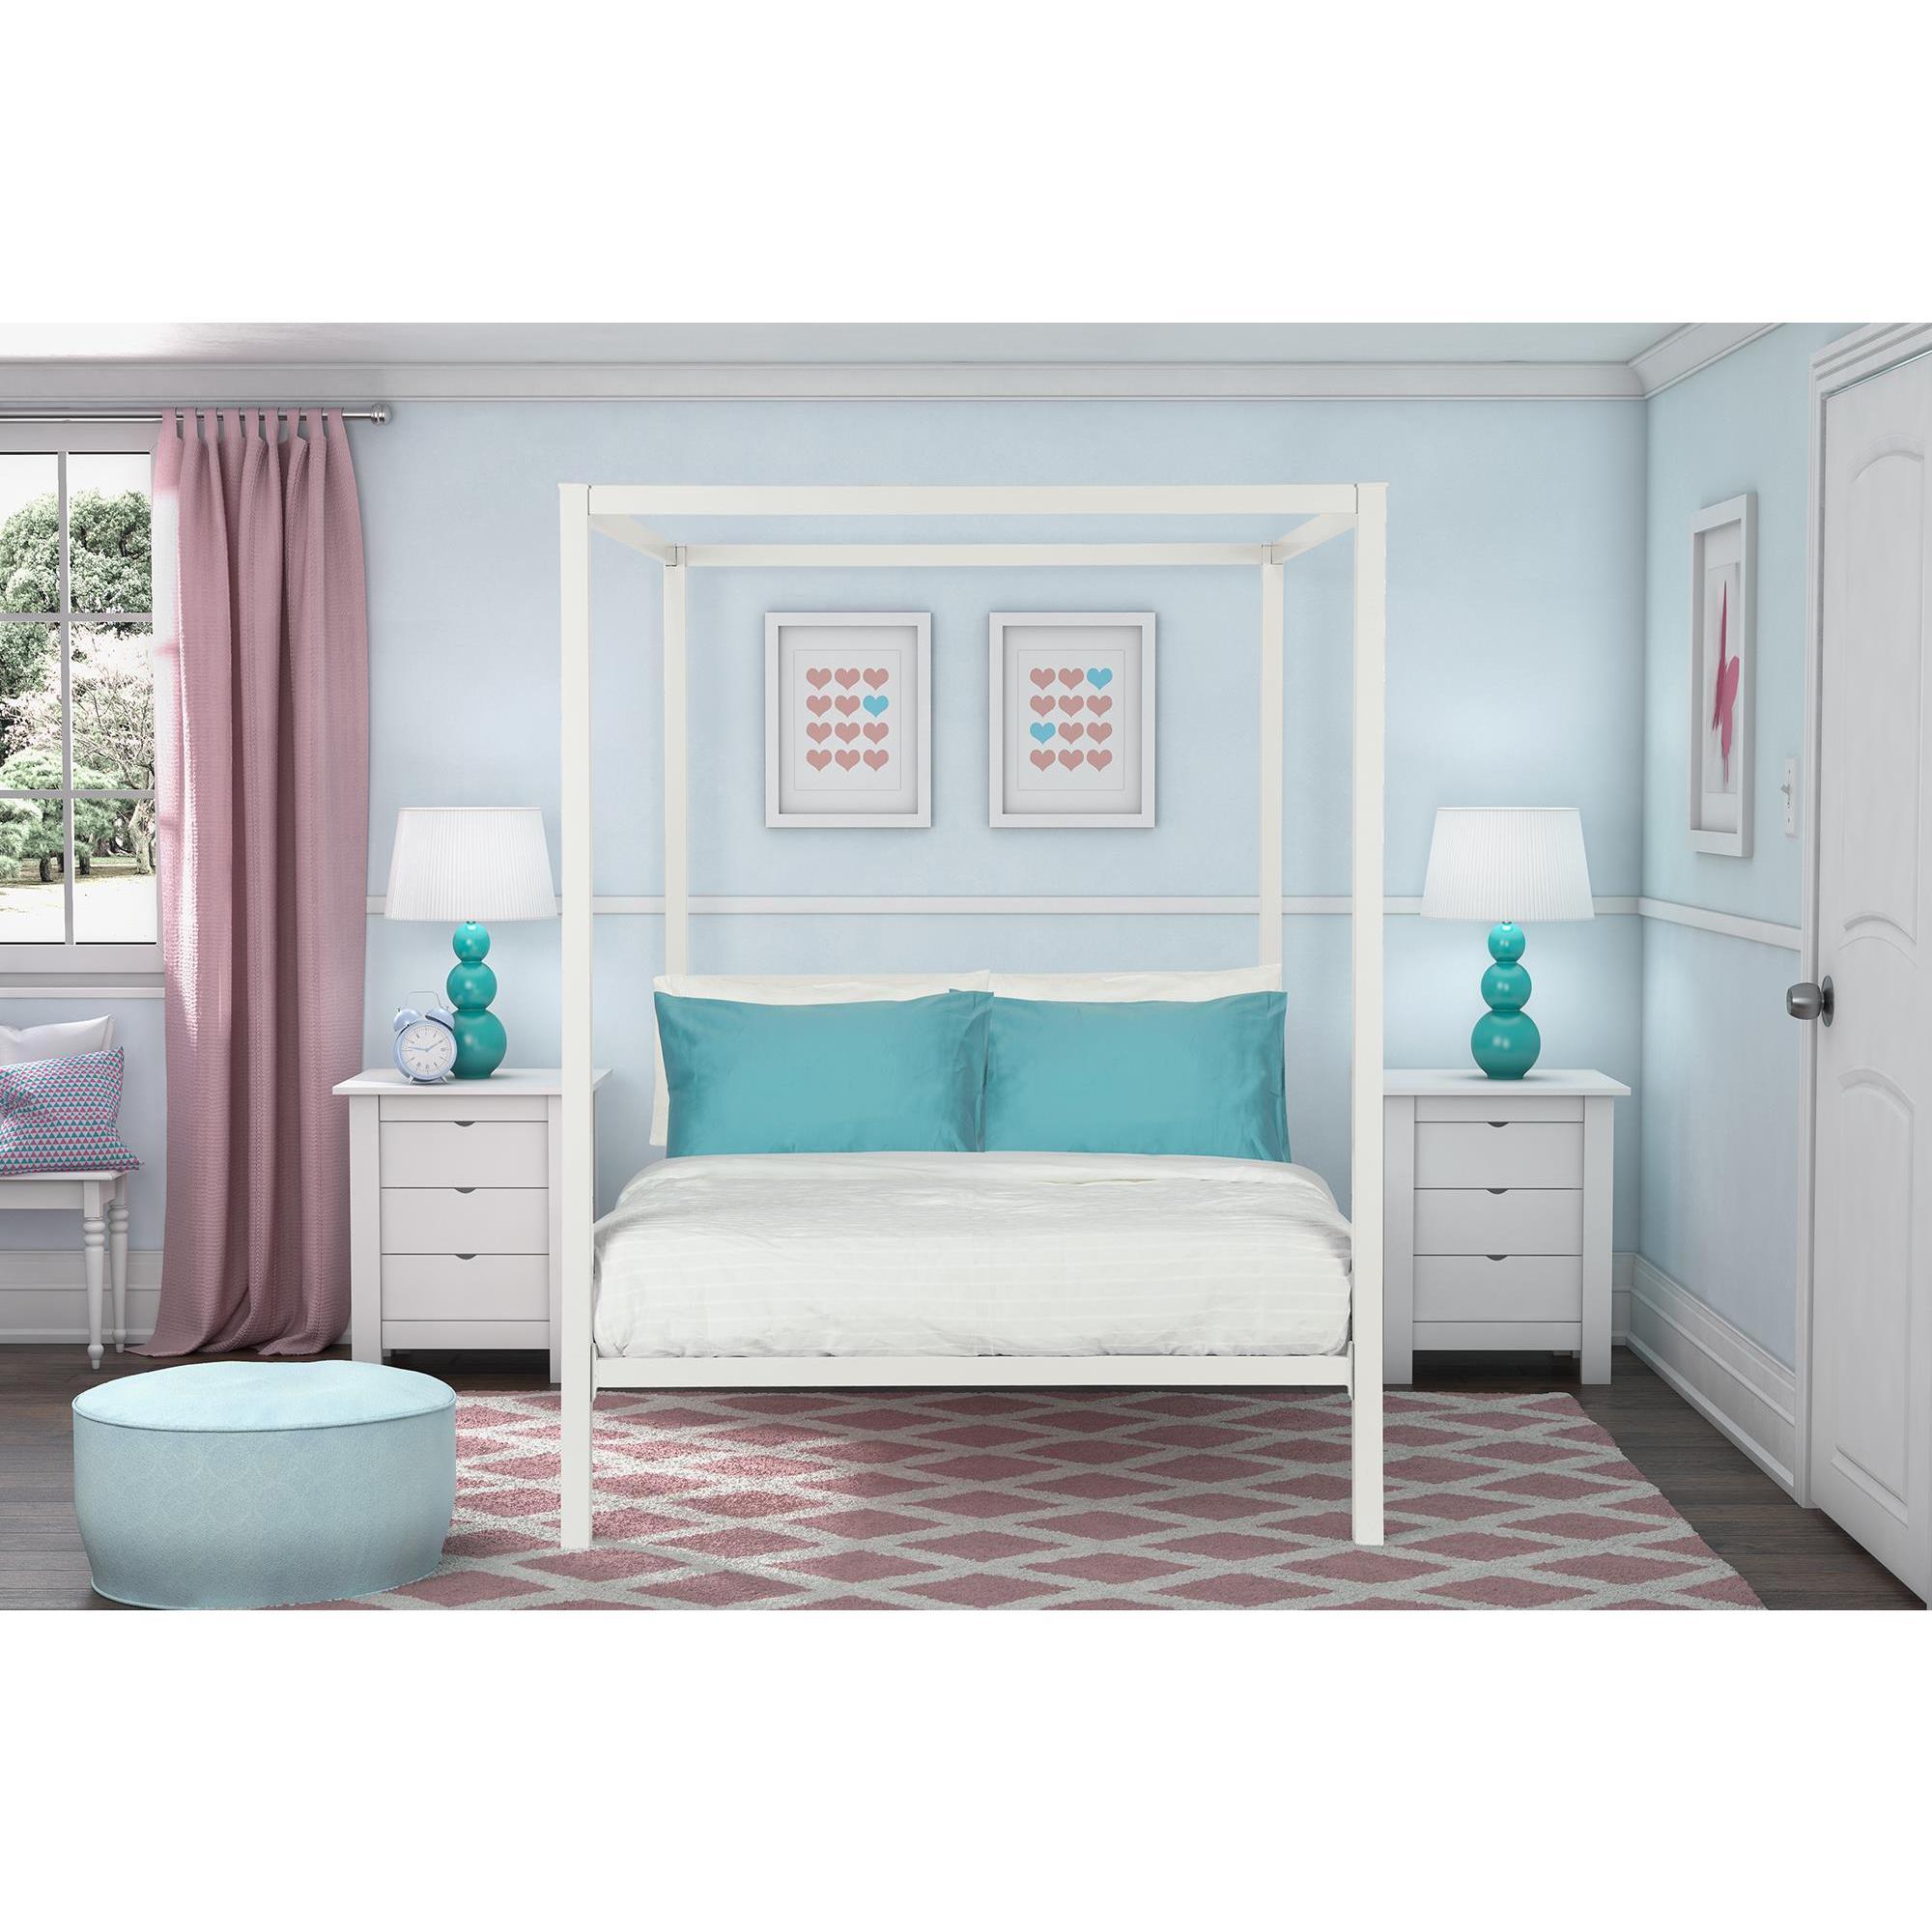 Dhp Modern White Metal Full Canopy Bed